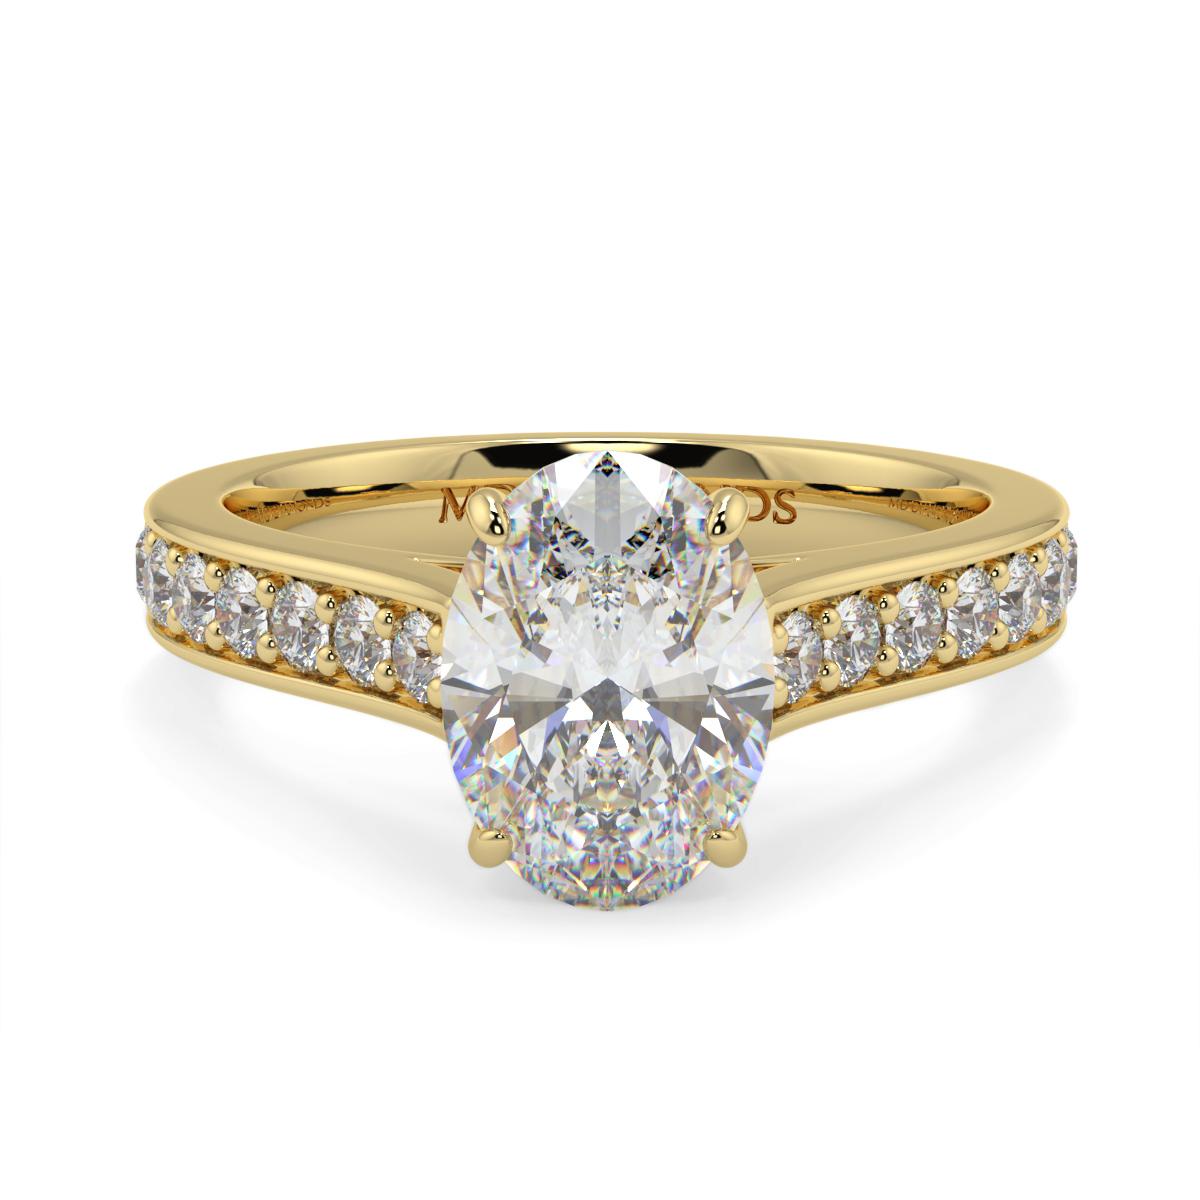 Oval Pave Set Diamond Ring